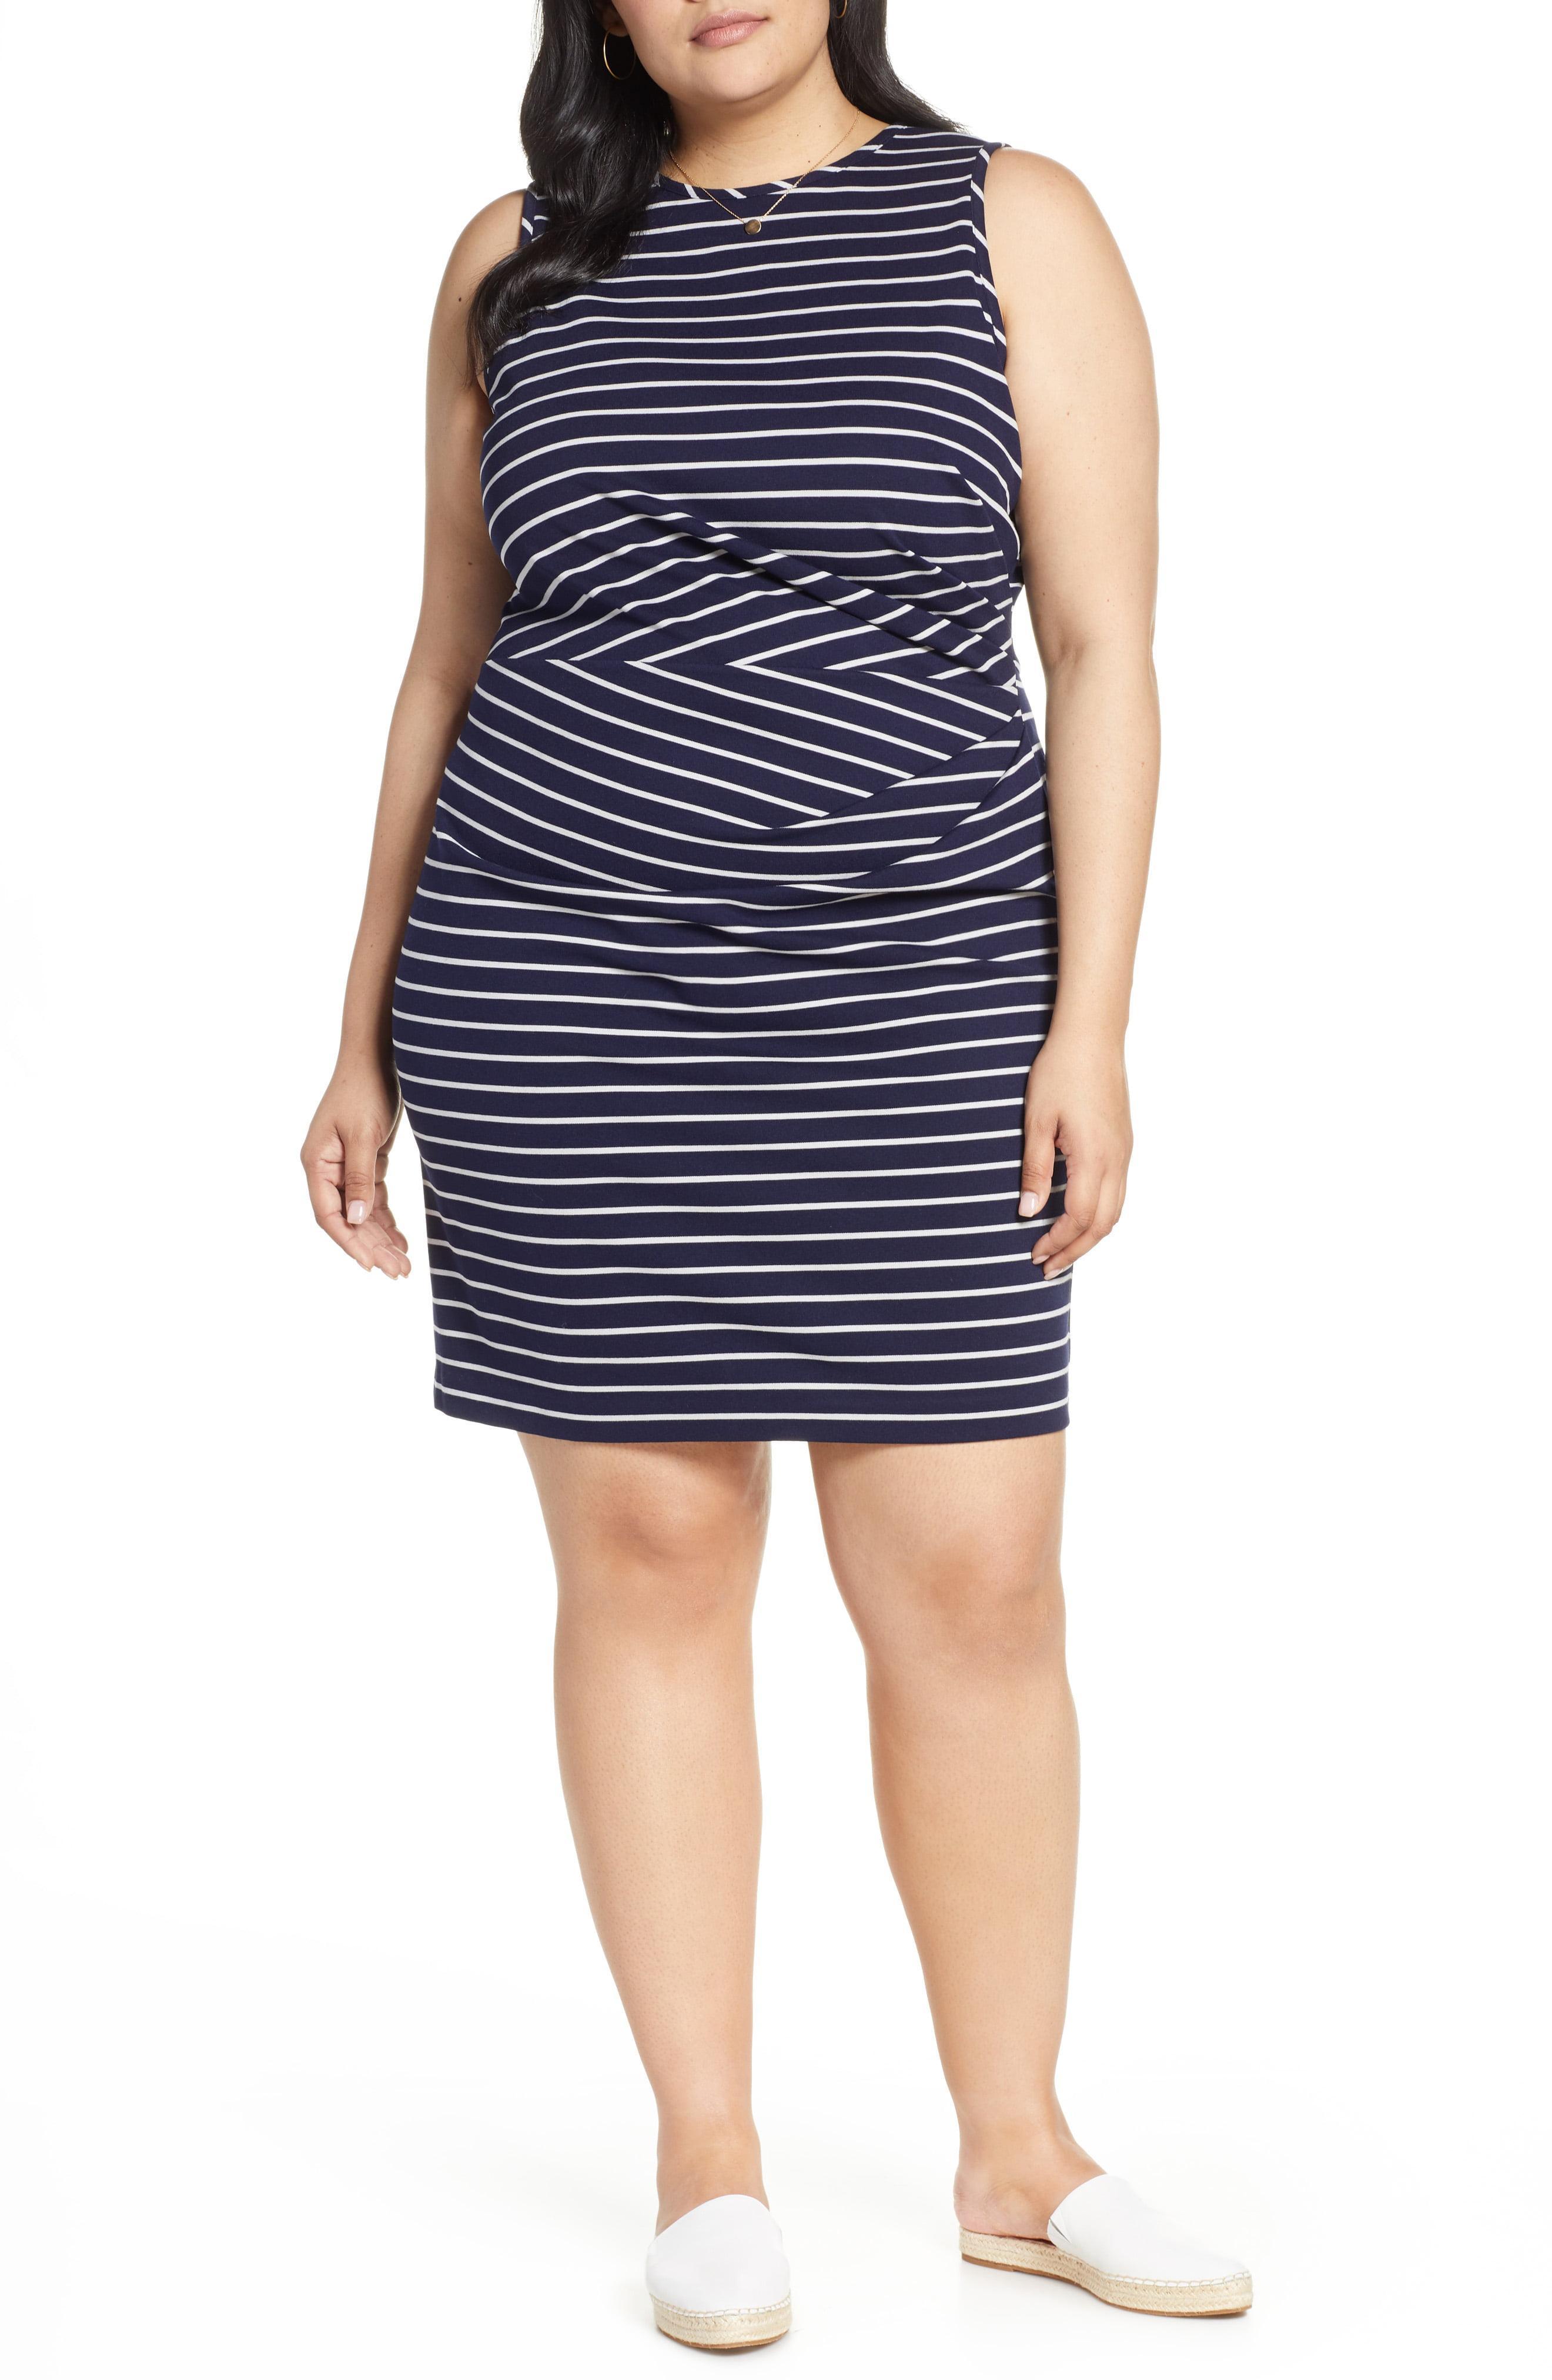 57c35841350 Lyst - Nordstrom 1901 Gathered Stripe Dress in Blue